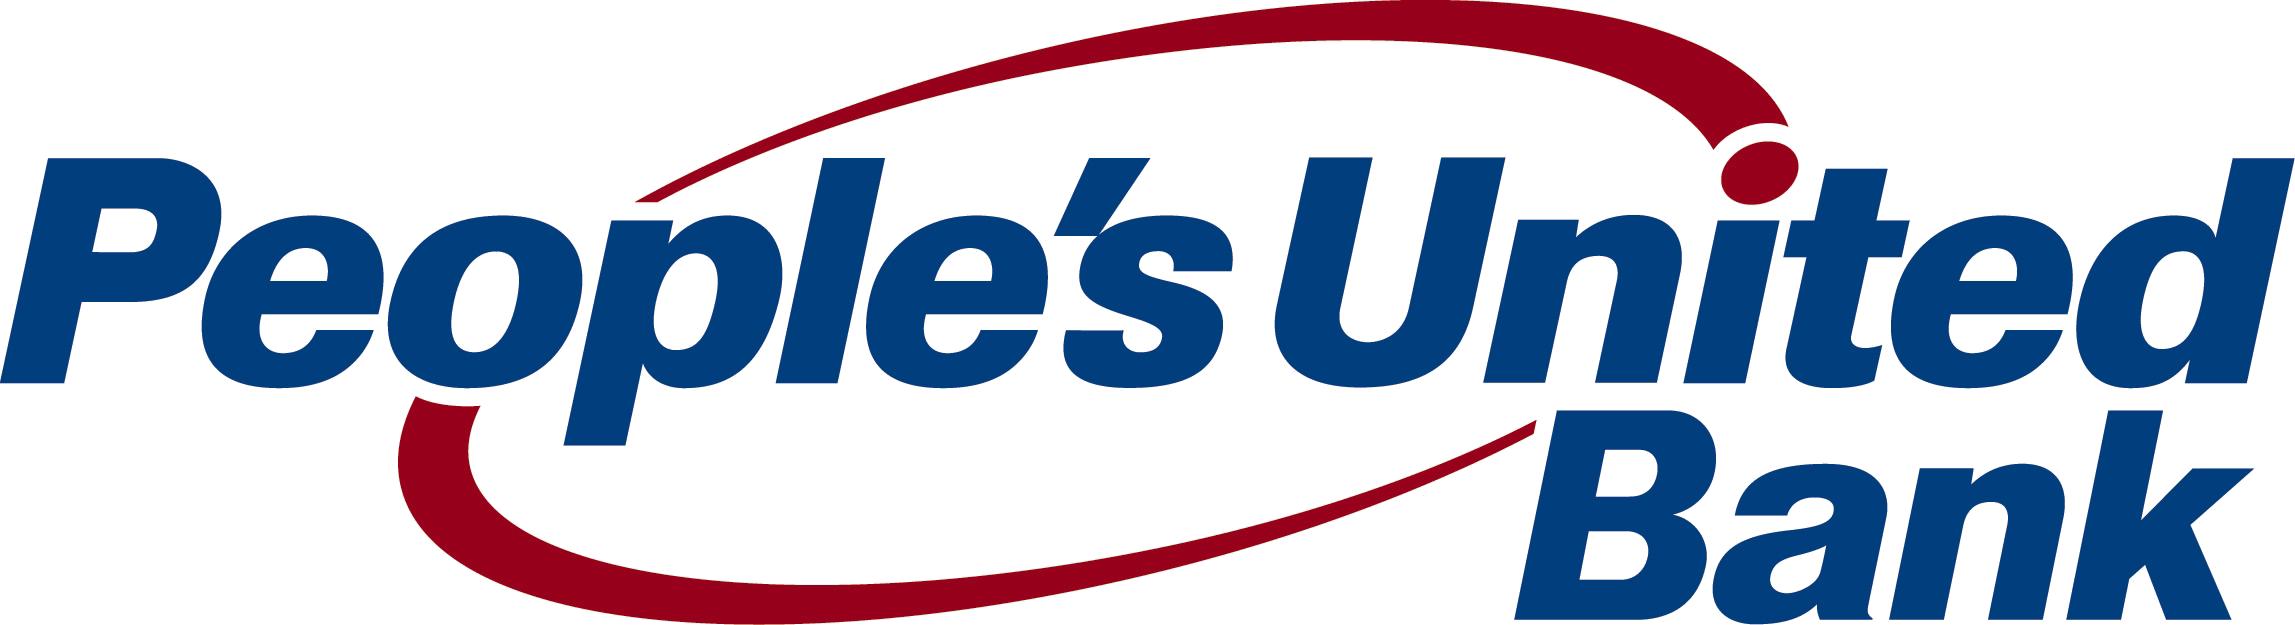 PeoplesUnitedBank-logo_344151216.png